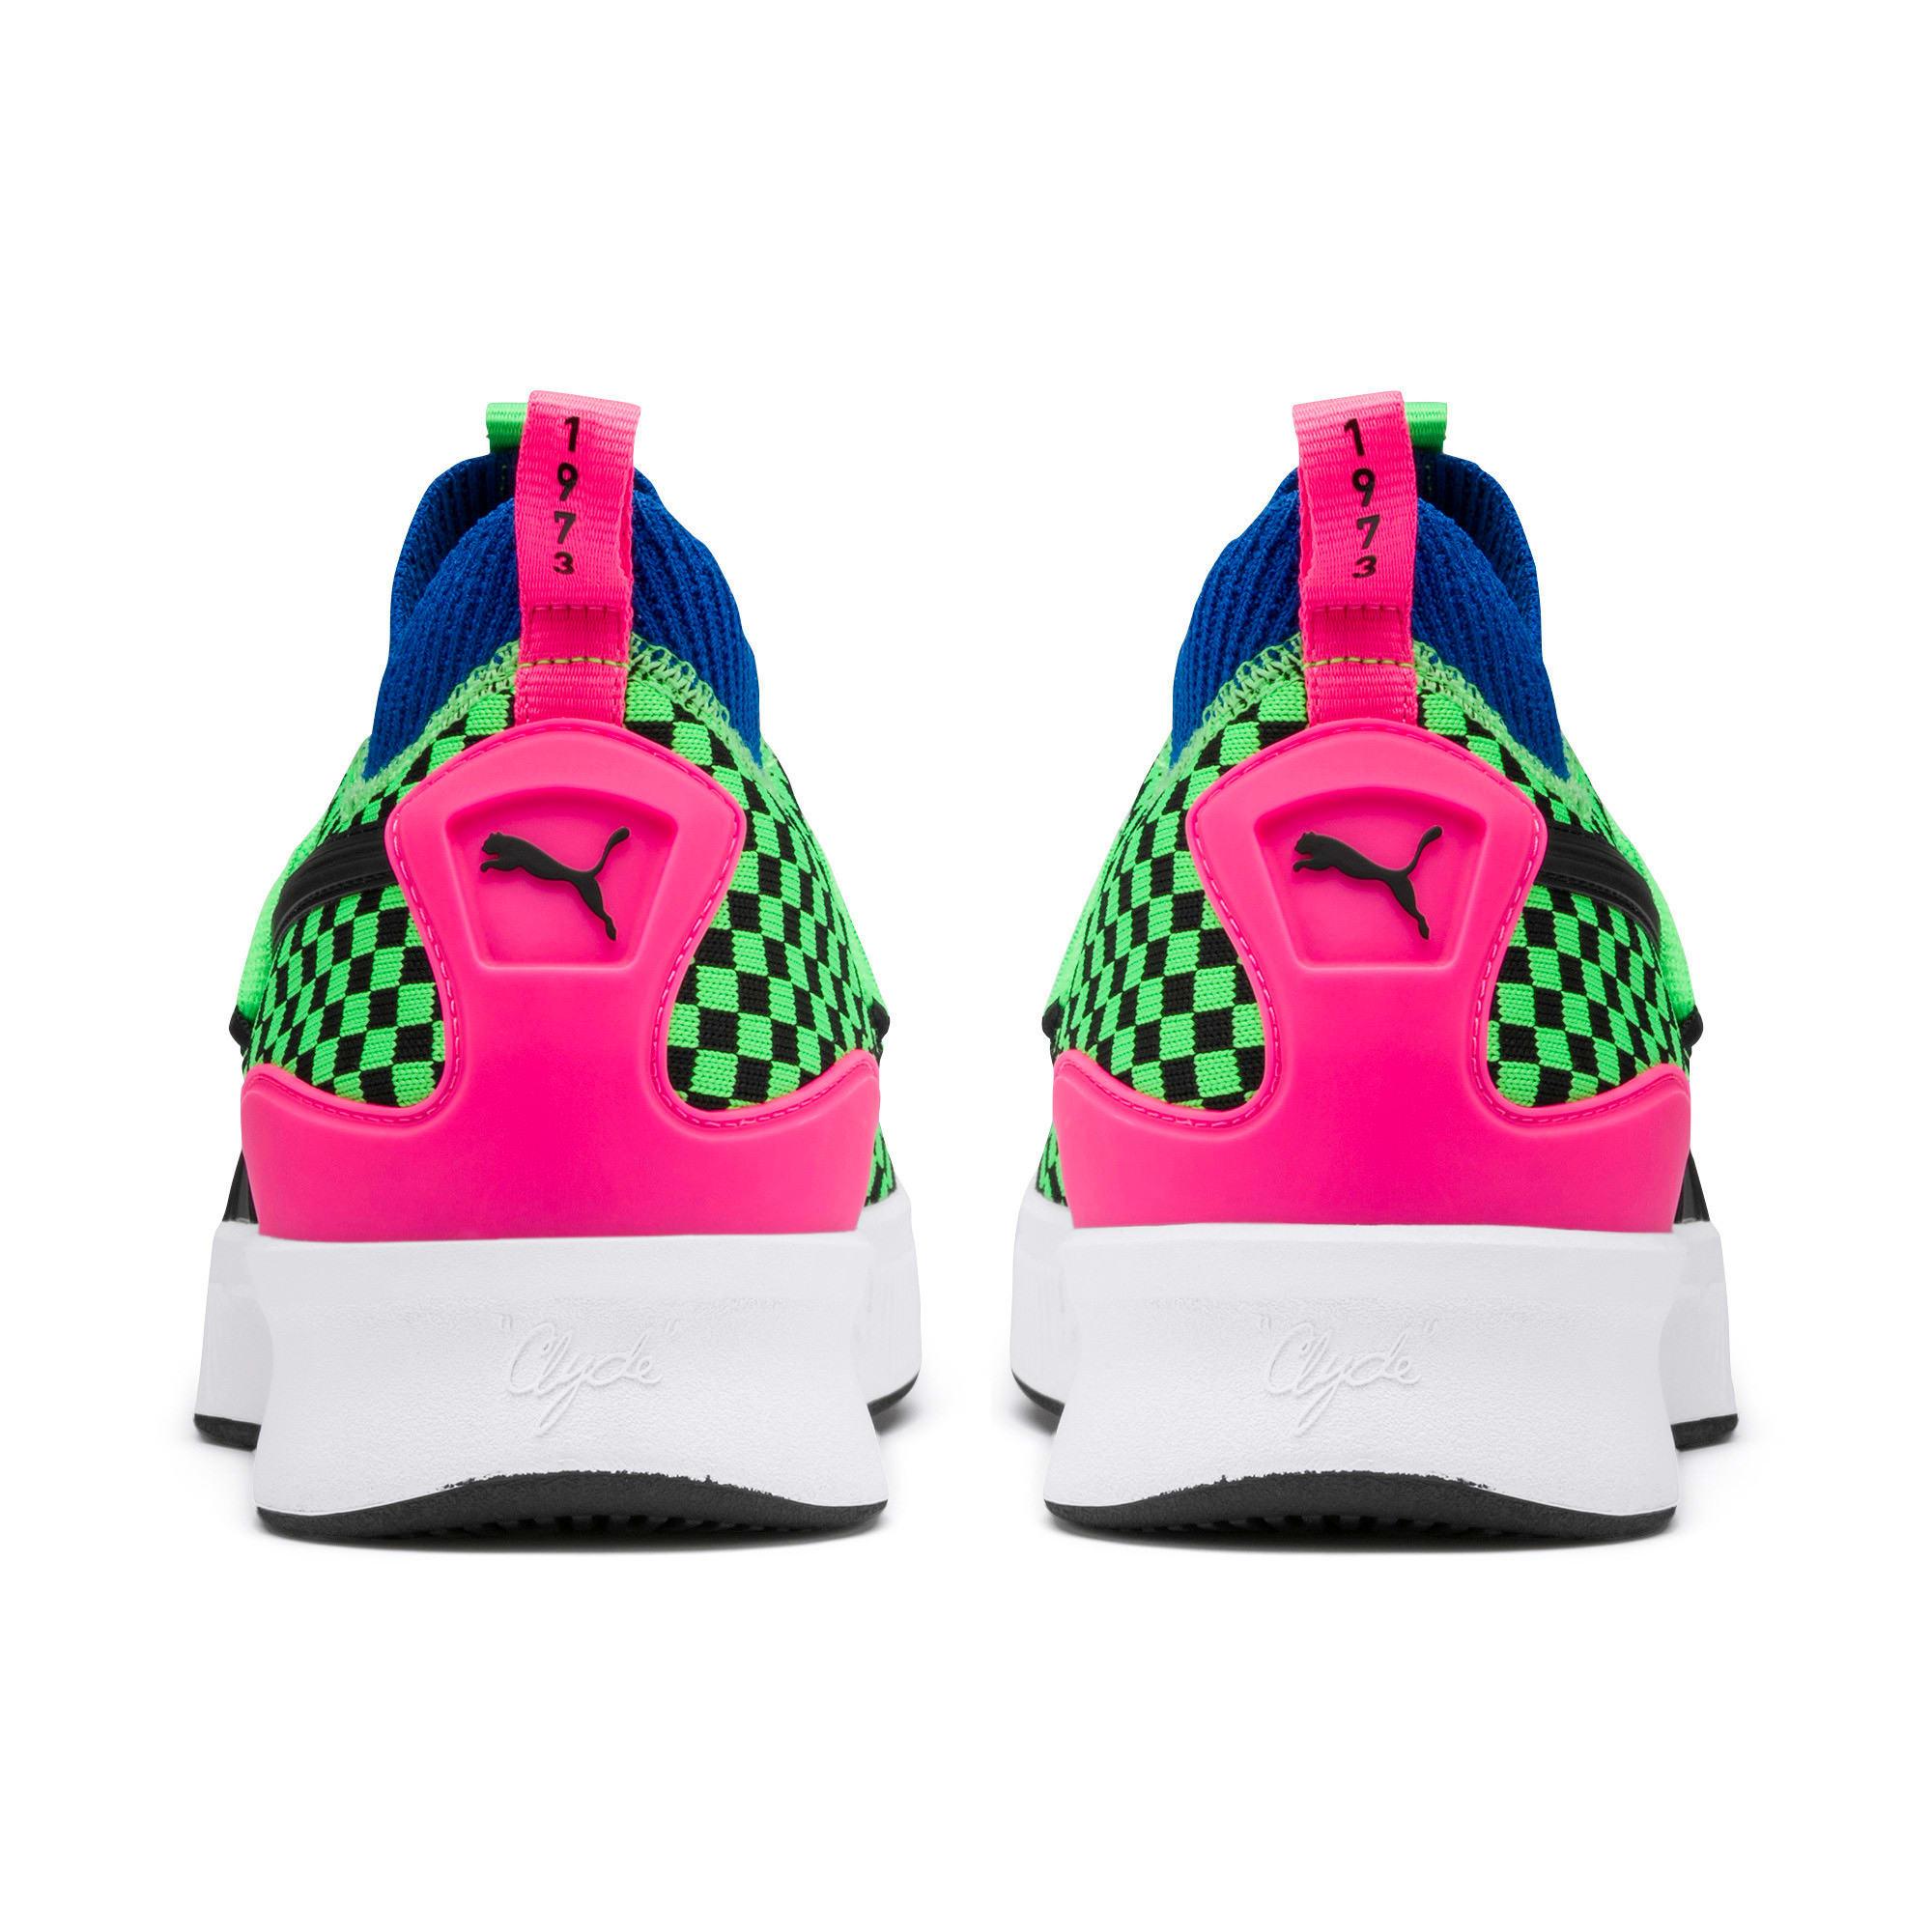 Thumbnail 3 of Clyde Court Summertime Basketball Shoes, 802 C Fluro Green PES, medium